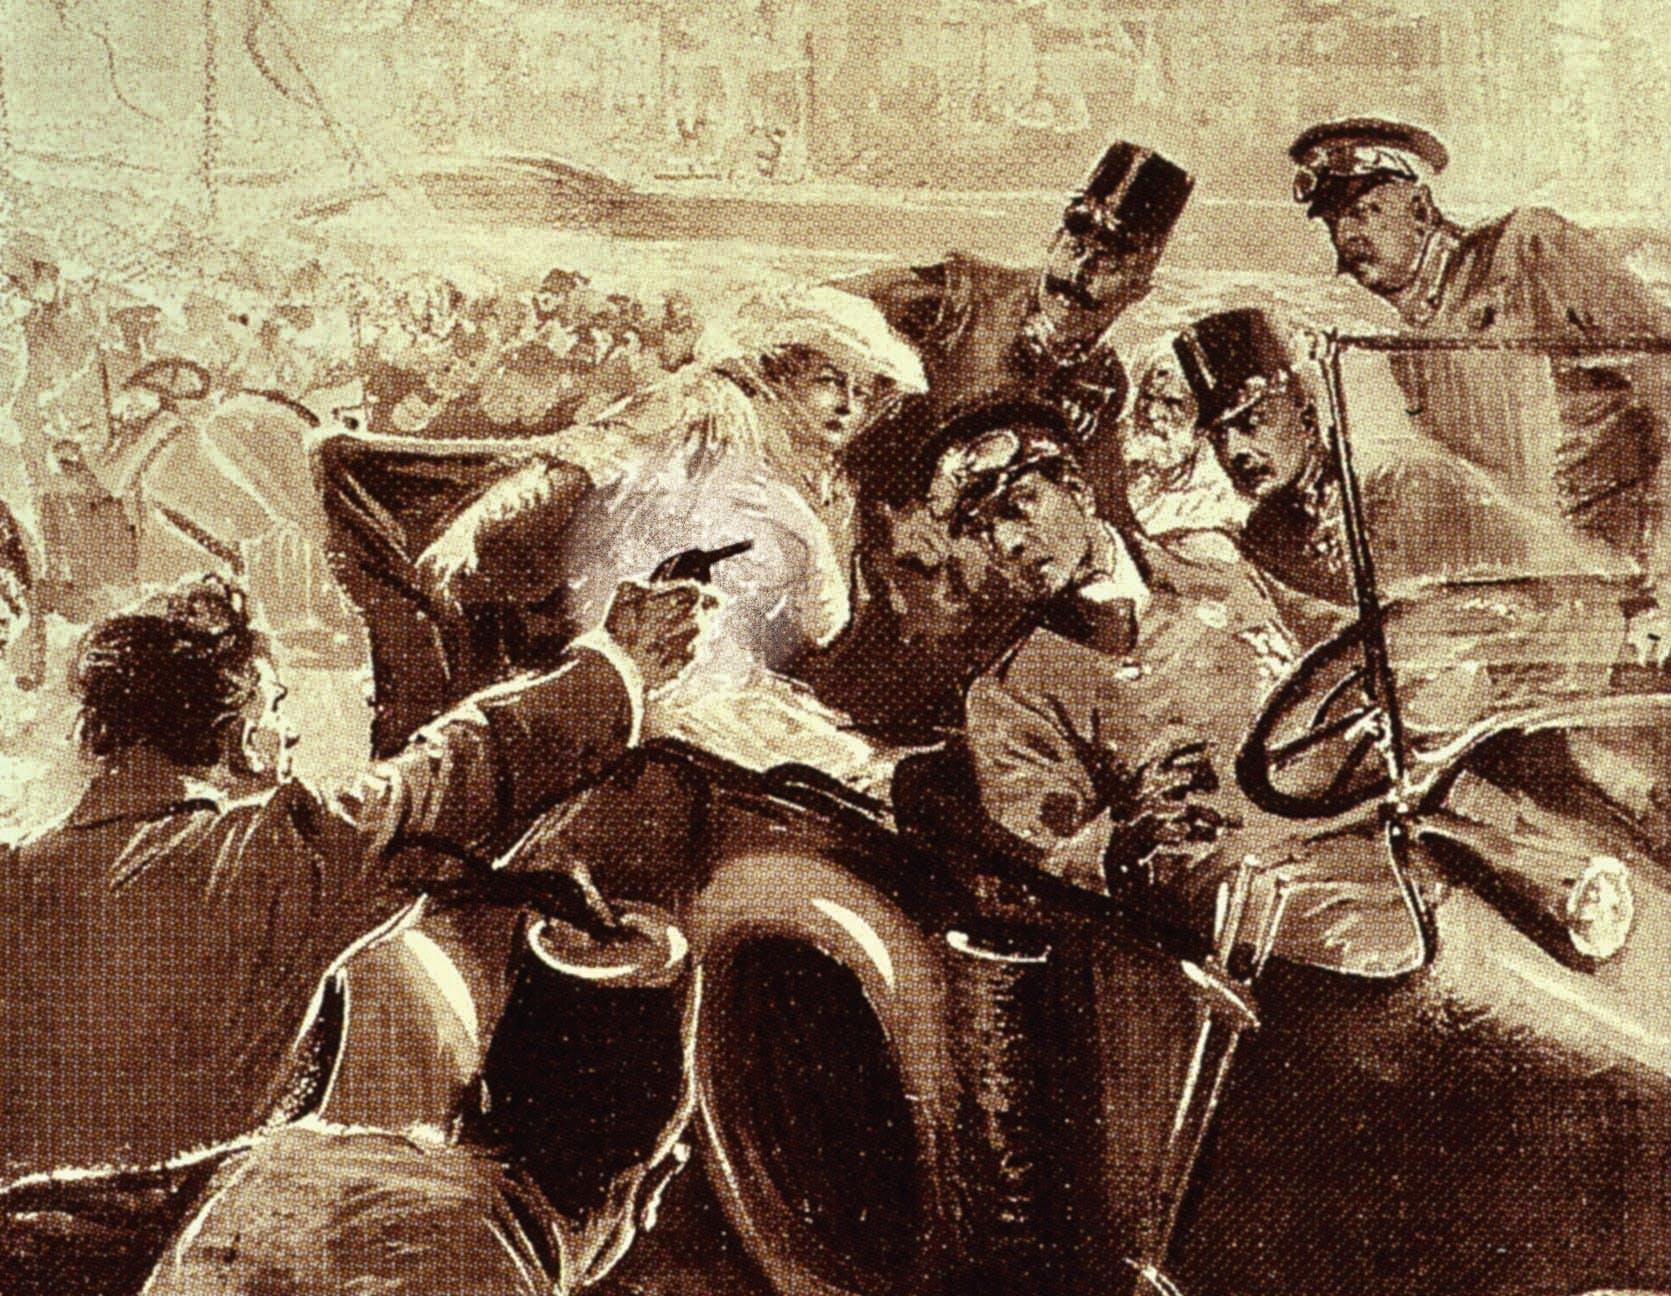 1. verdenskrig: Tidslinje | Historienet.dk